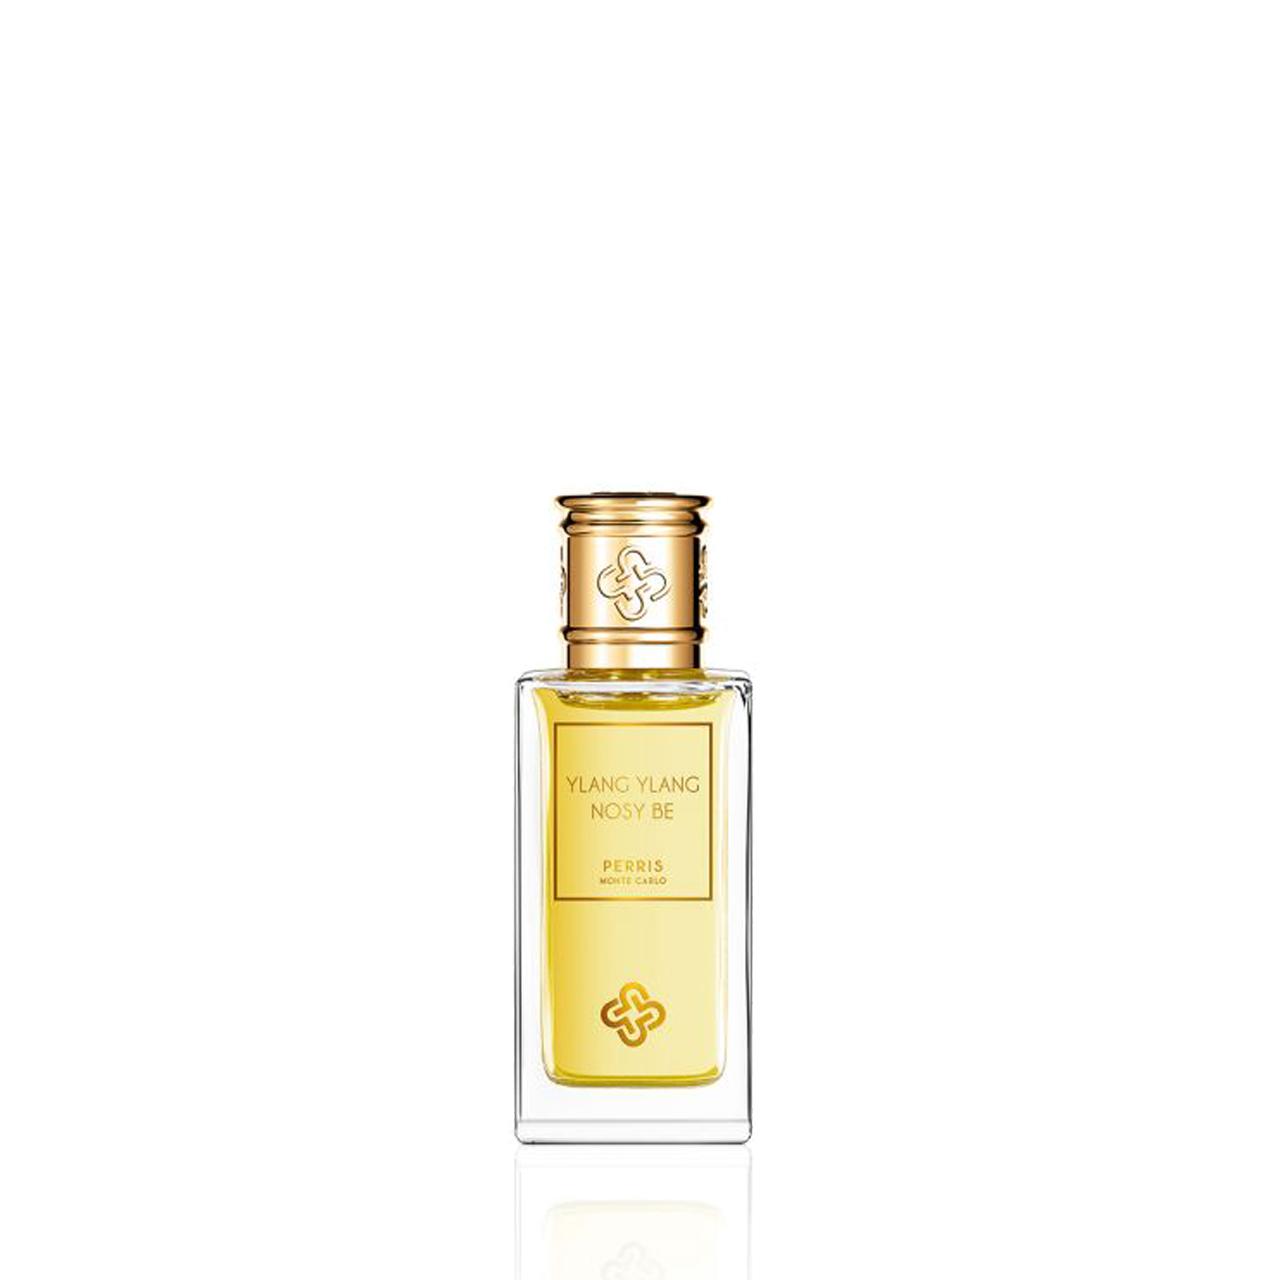 Ylang Ylang Nosy Be - Extrait de Parfum